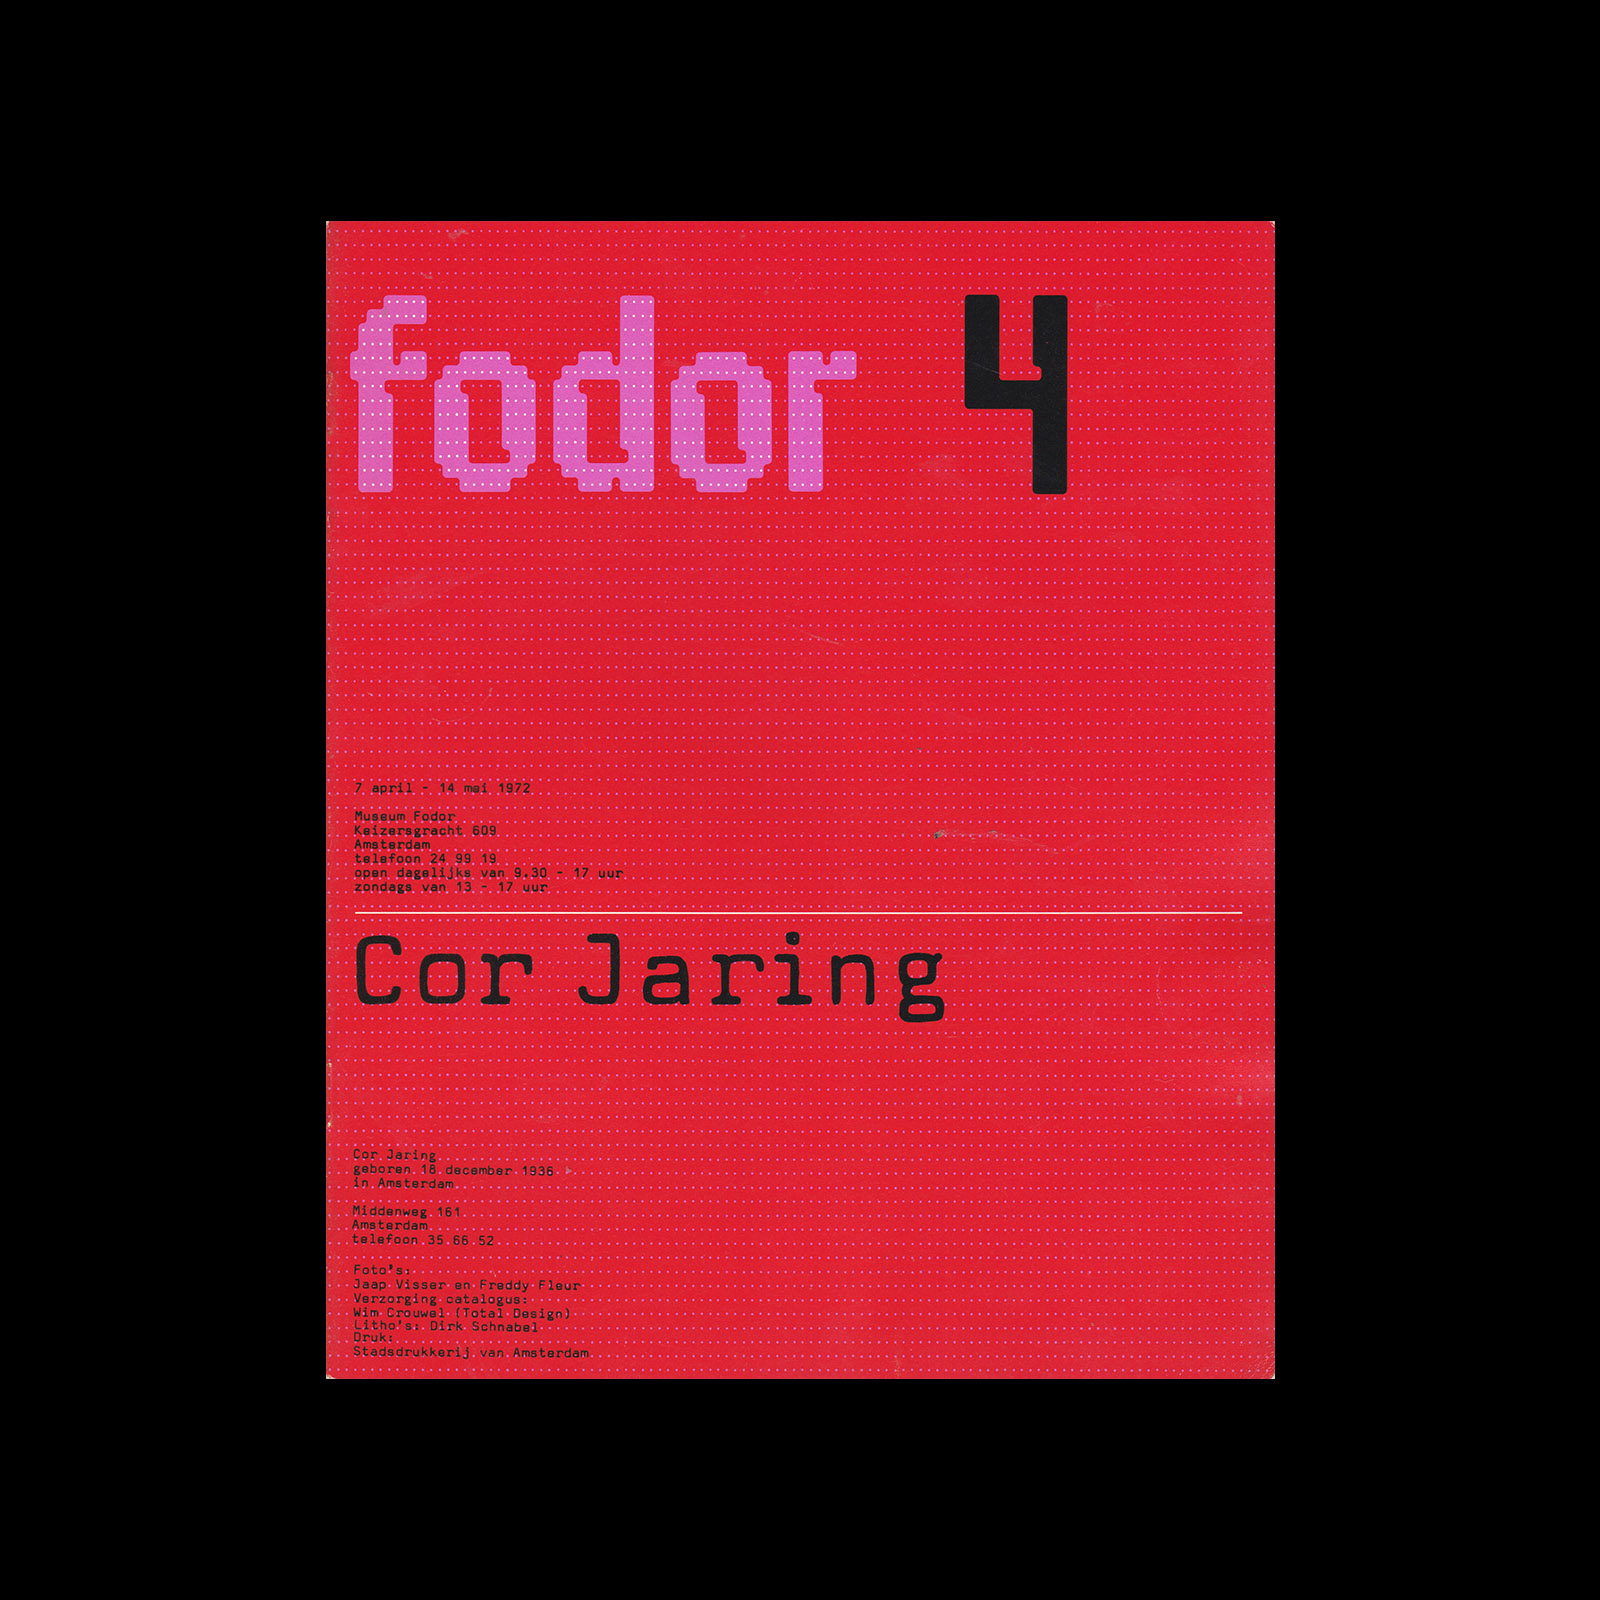 Fodor 4, 1972 - Cor Jaring